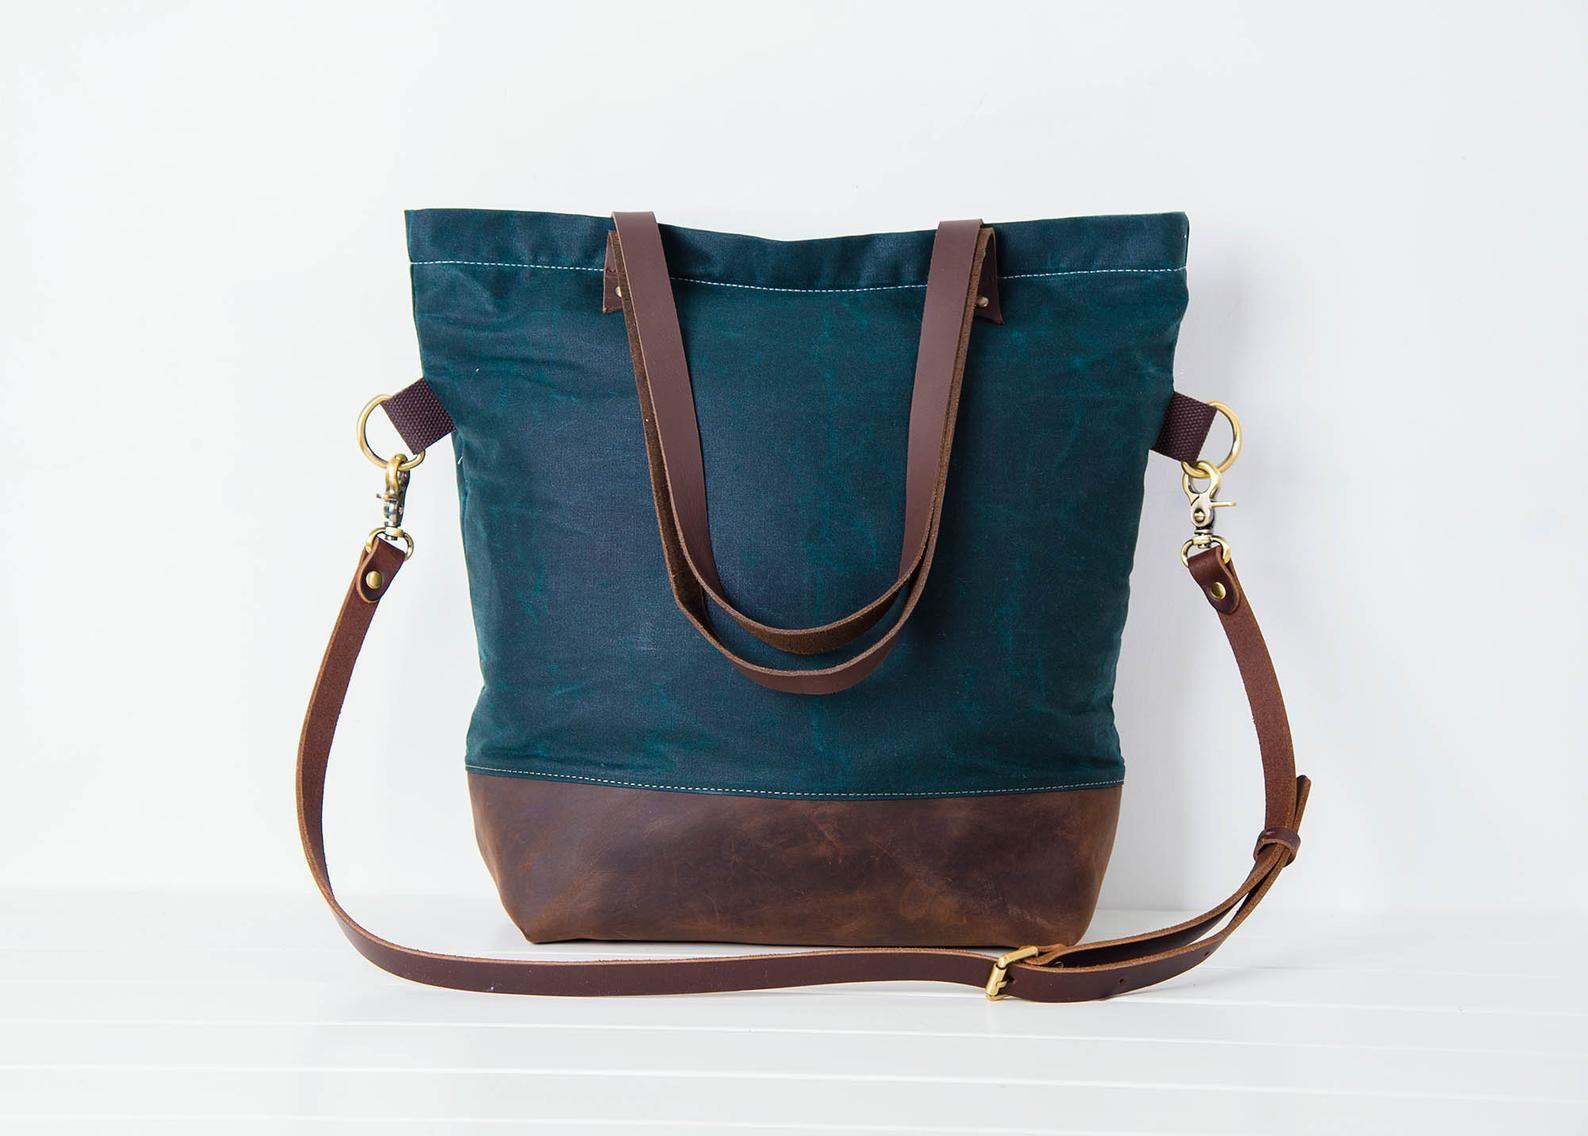 Cherryi crossbody bag women genuine leather shoulder bag messenger small,Blue, 20cm-Max Length-30cm